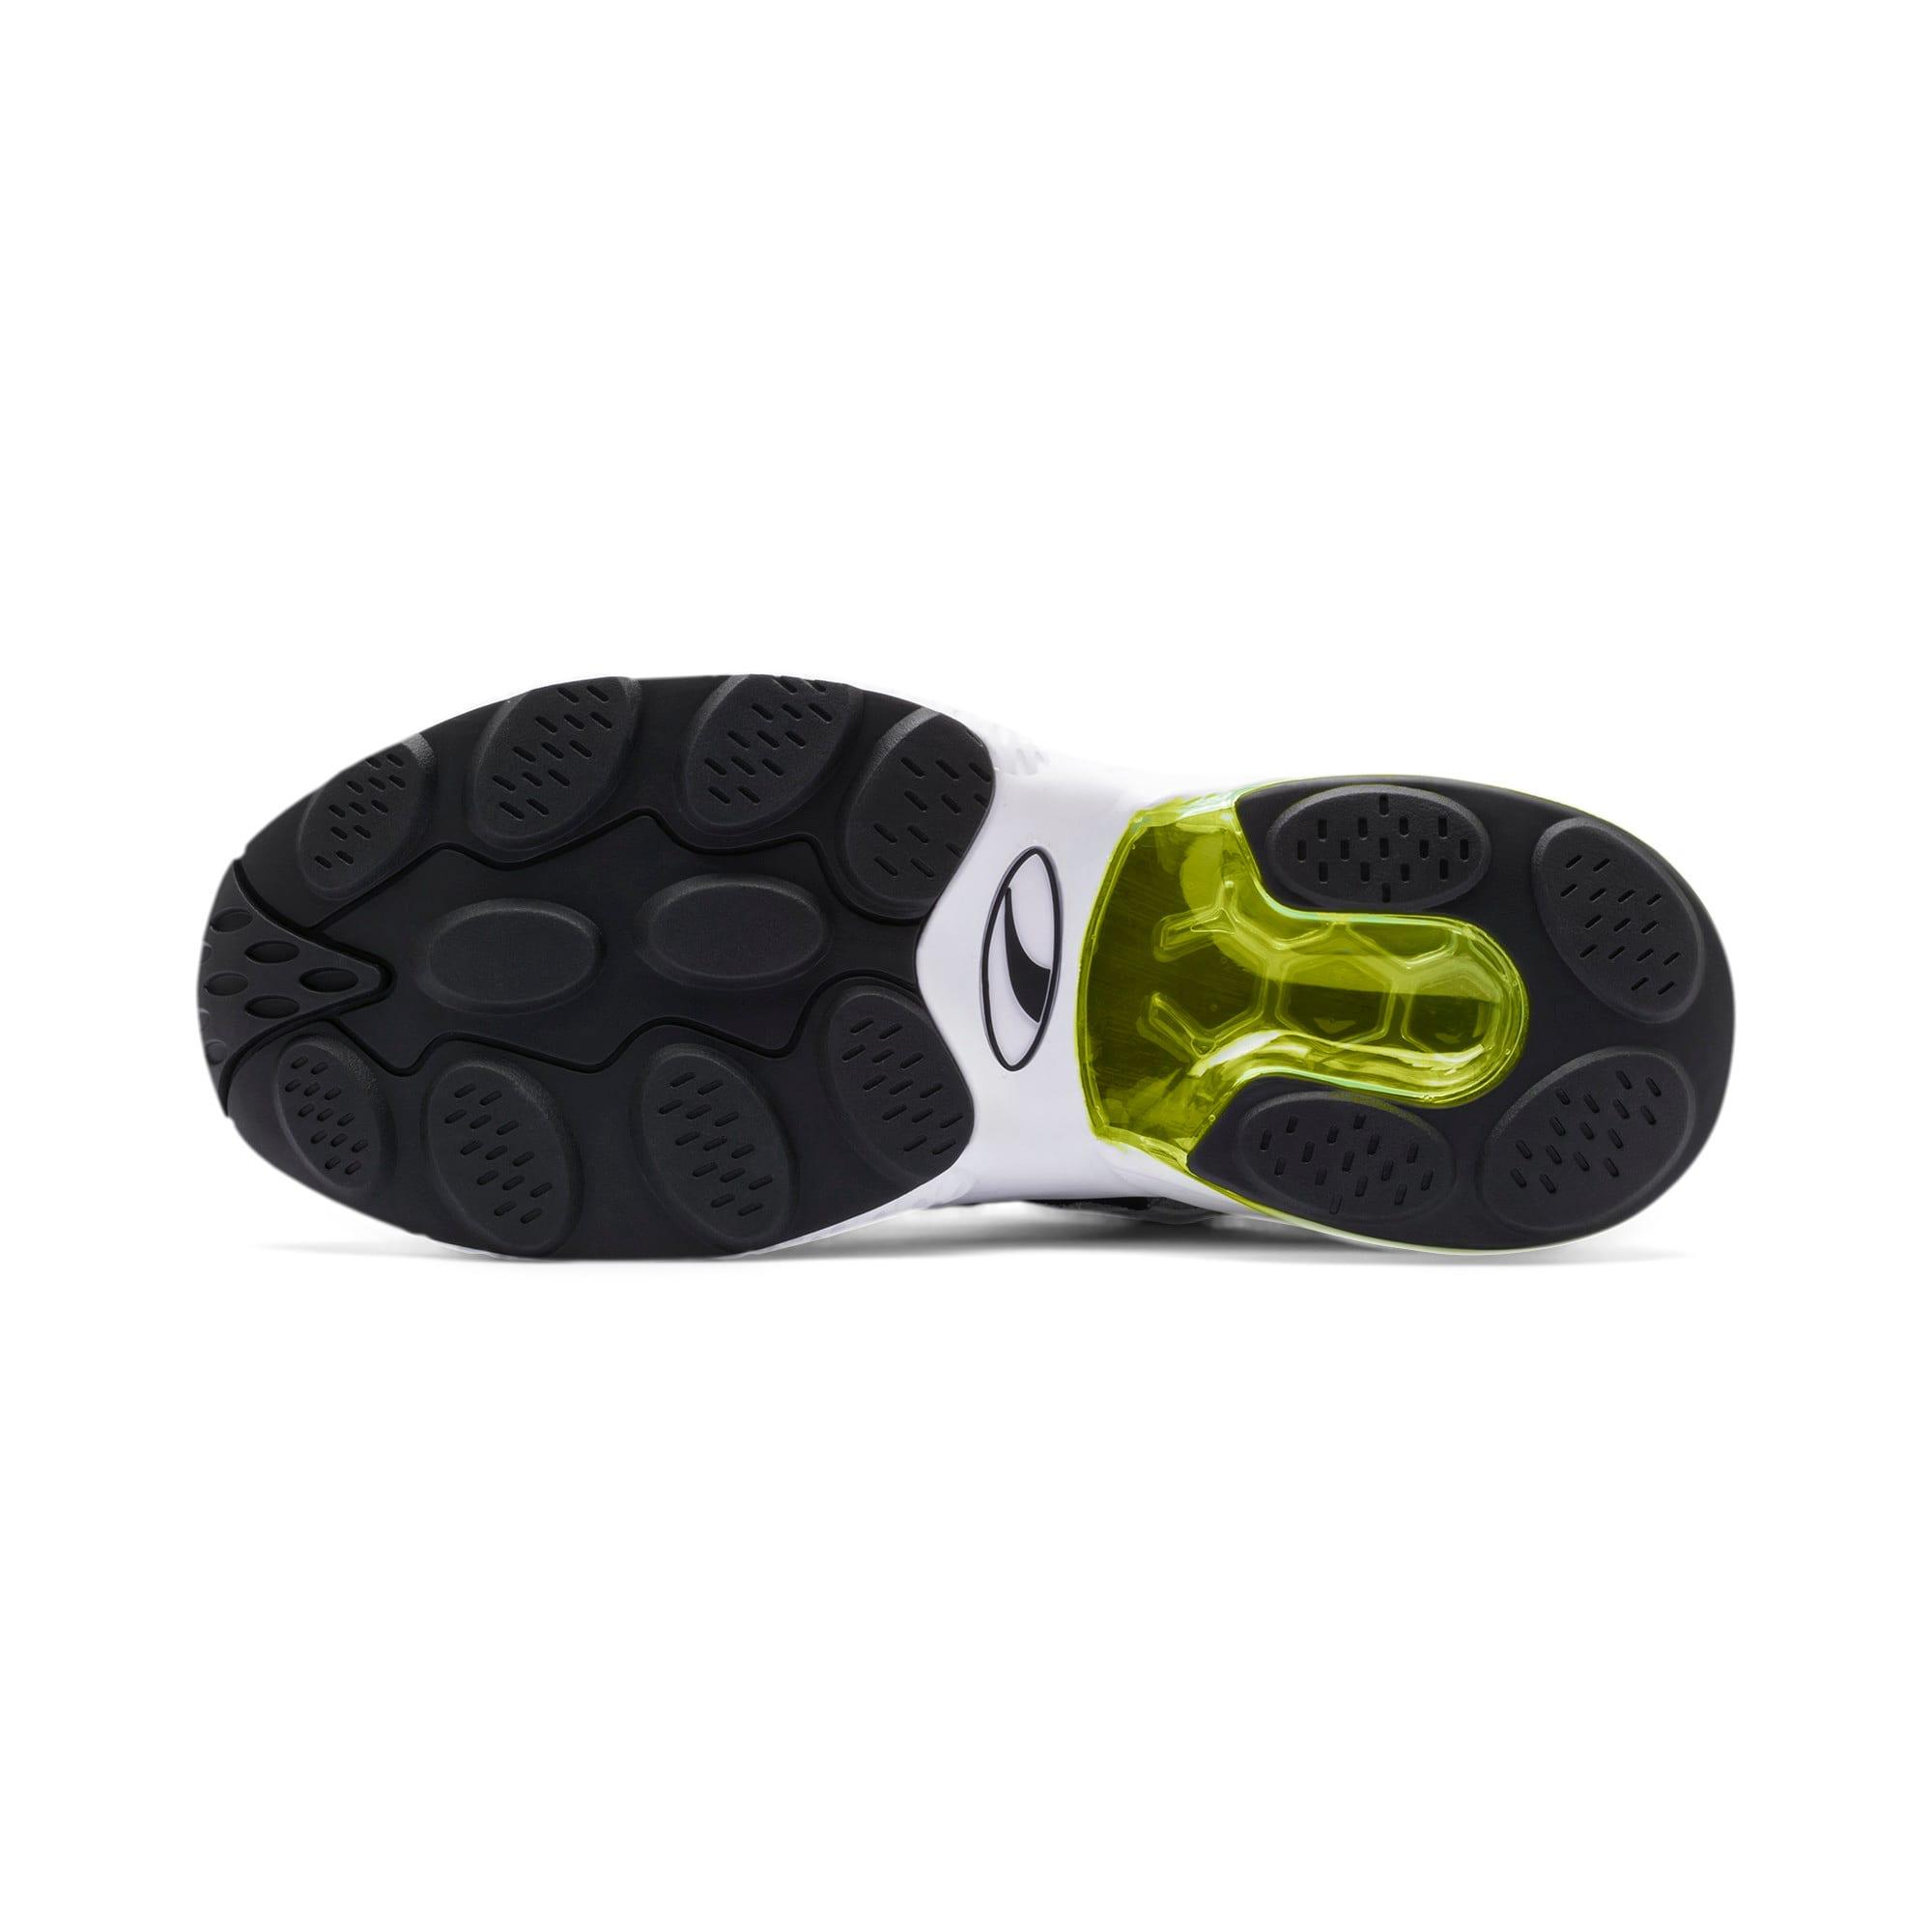 Thumbnail 5 of CELL Venom Alert Sneakers, Puma White-Puma Black, medium